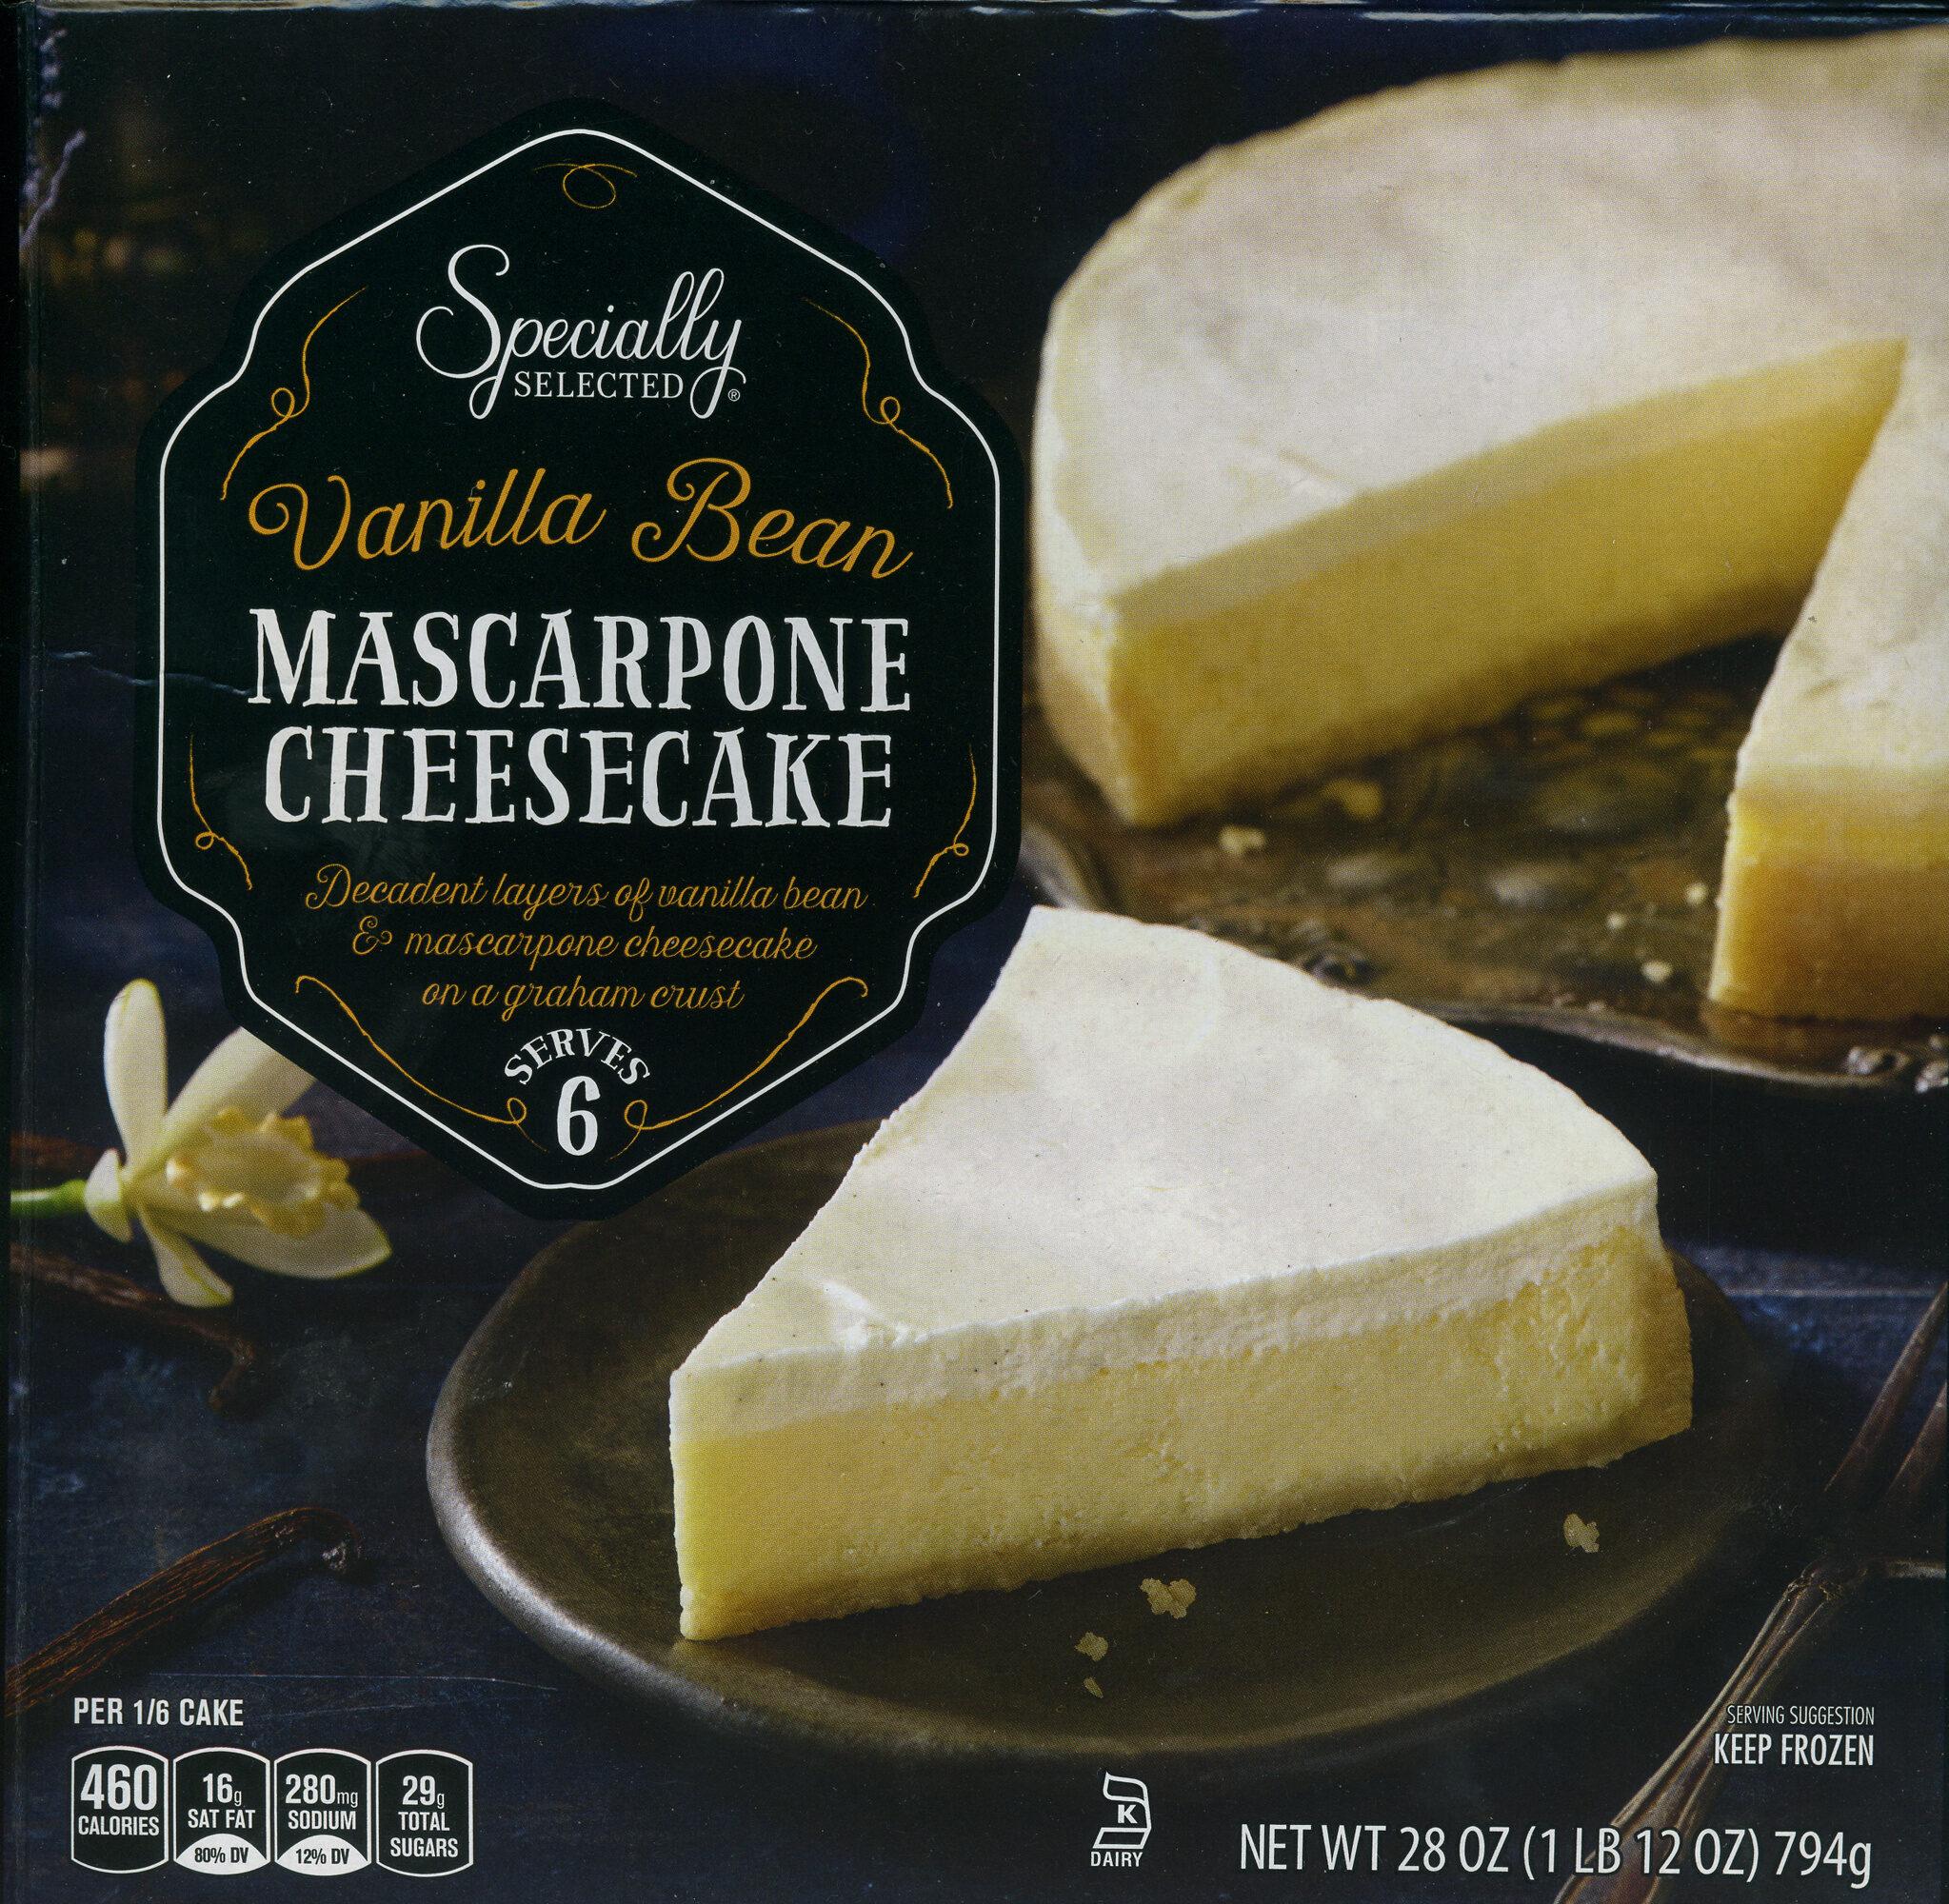 Specially Selected Vanilla Bean Mascarpone Cheesecake - Product - en